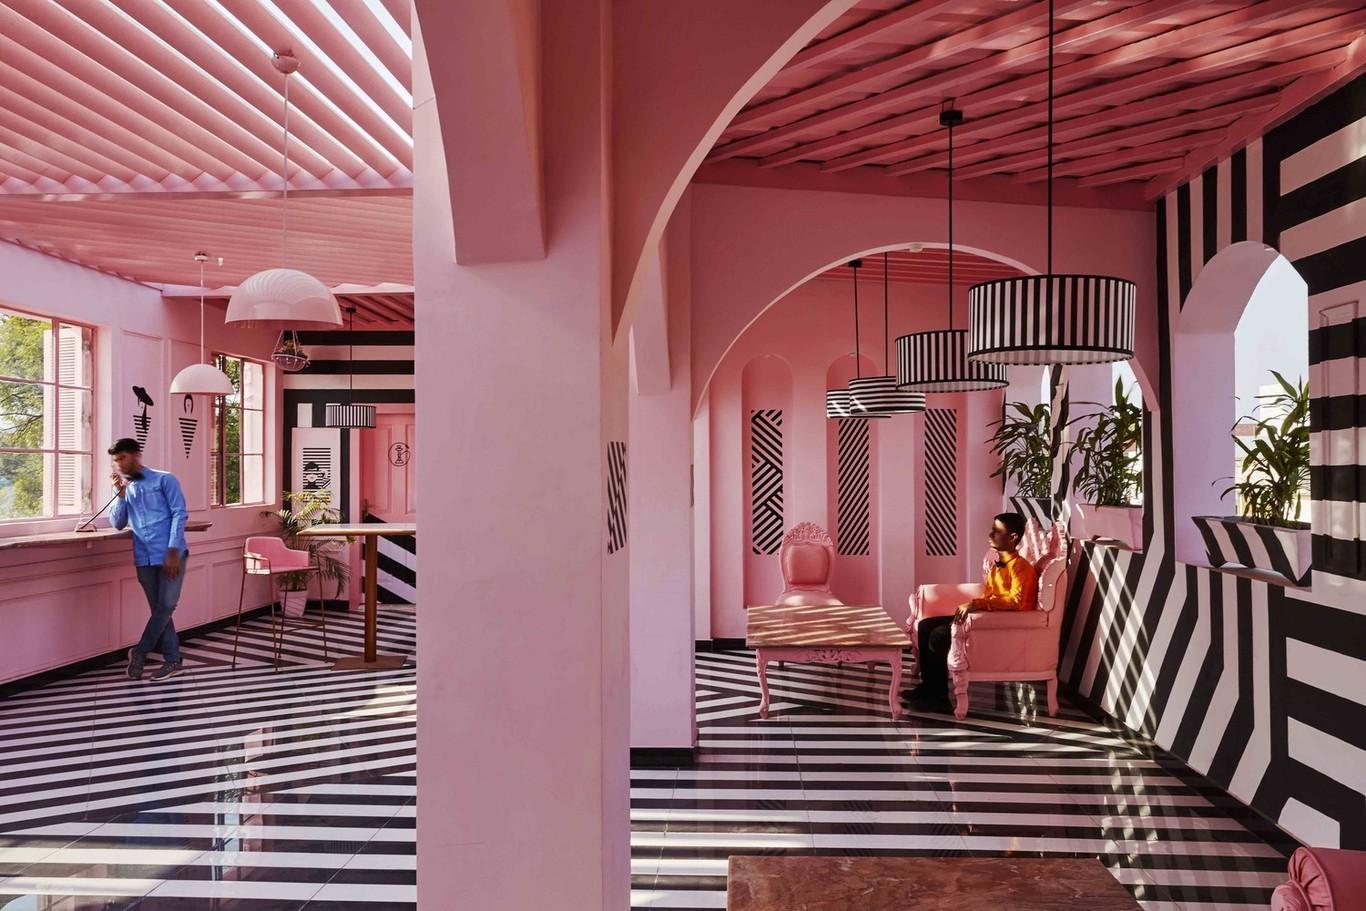 Marzua: Viajamos a la India para descubrir The Pink Zebra, un ...